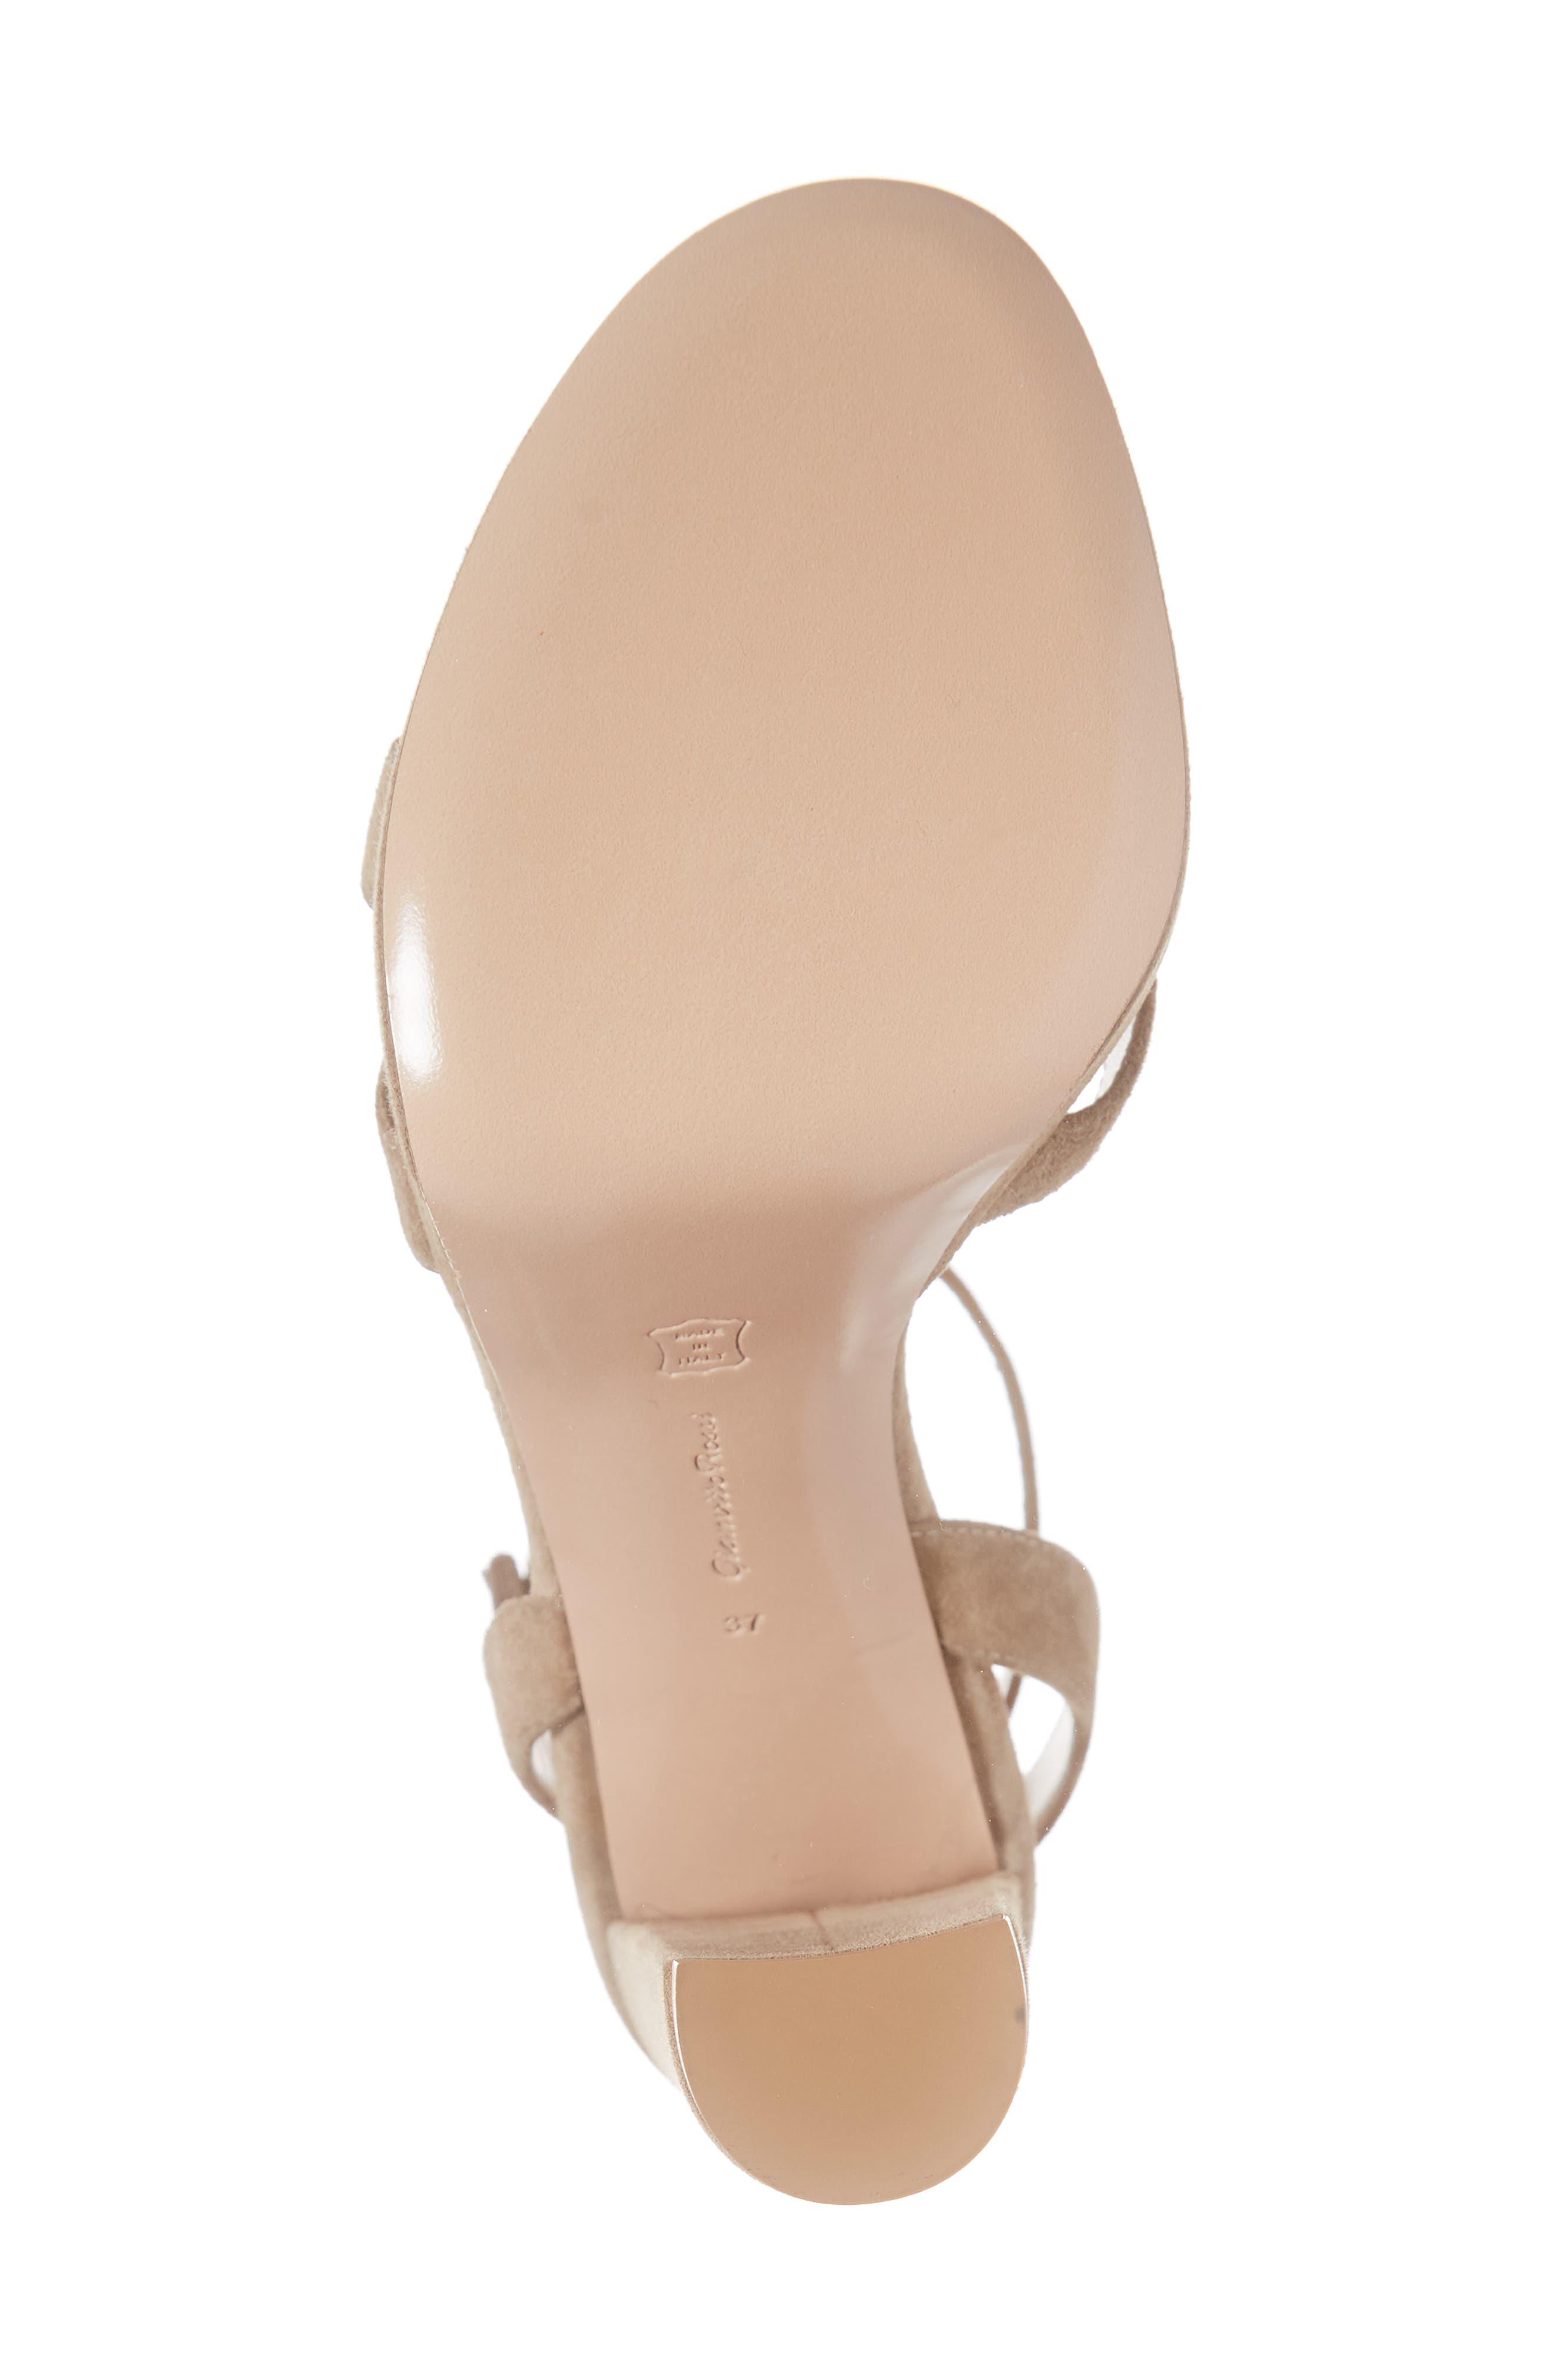 GIANVITO ROSSI, Ankle Strap Platform Sandal, Alternate thumbnail 6, color, CAMEL SUEDE